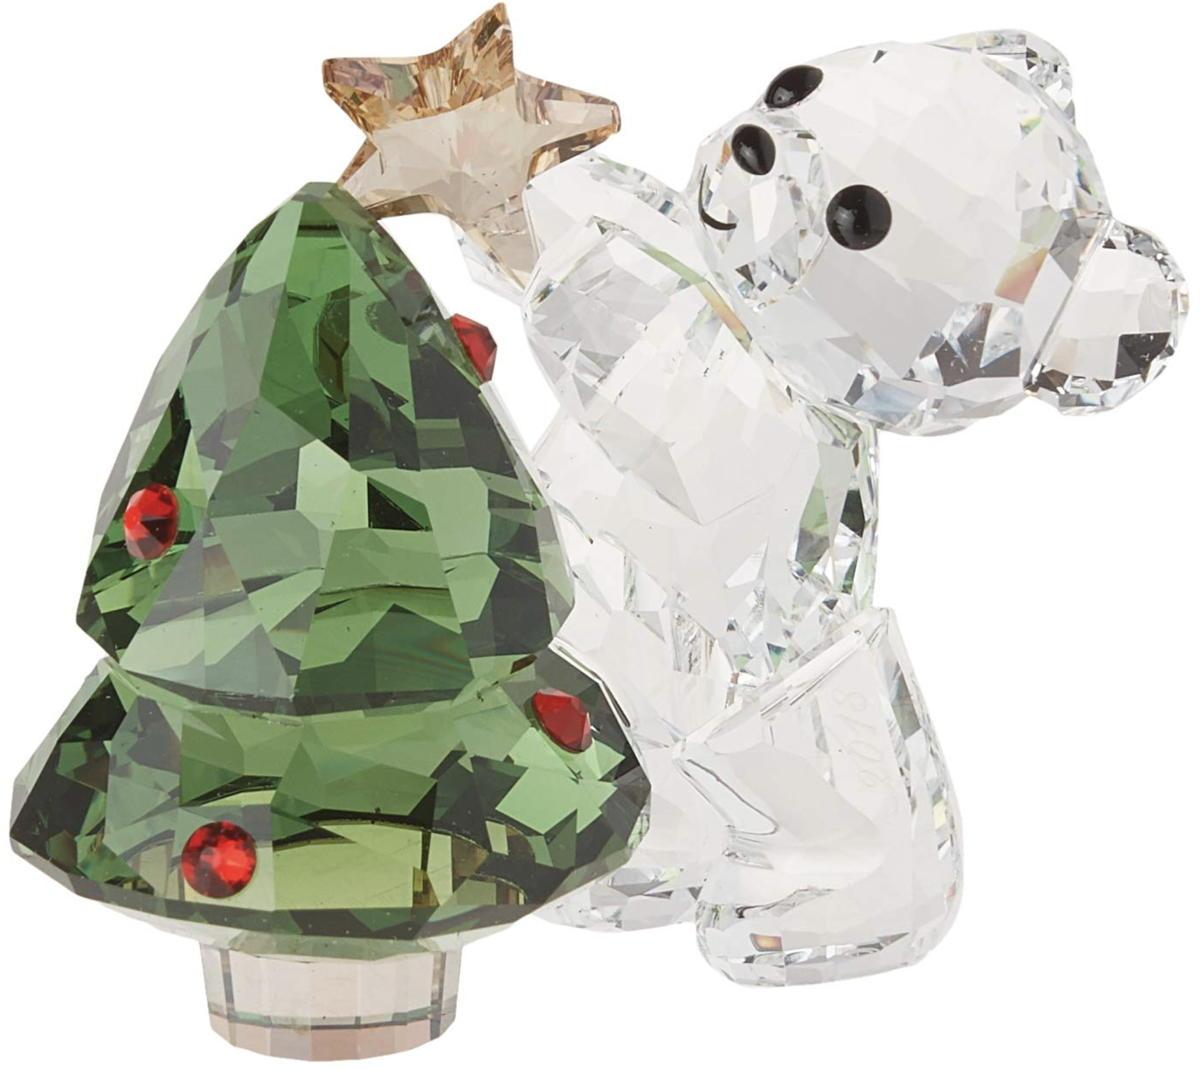 addobbi-natalizi-cristallo-foto-idee-costi-15